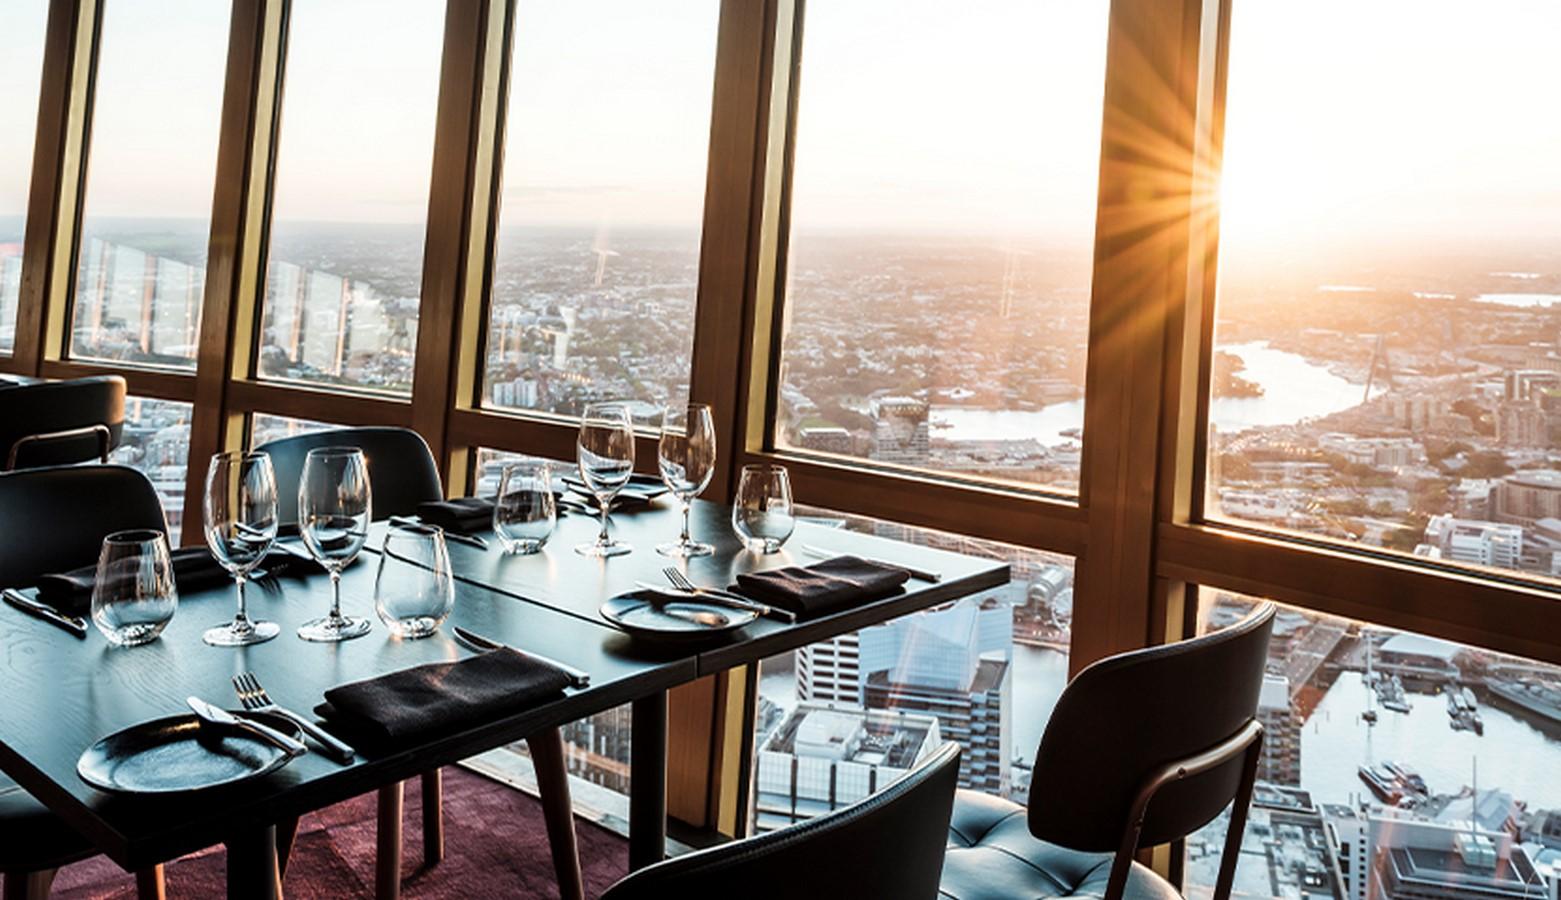 15 Examples of revolving hotels - Sheet5